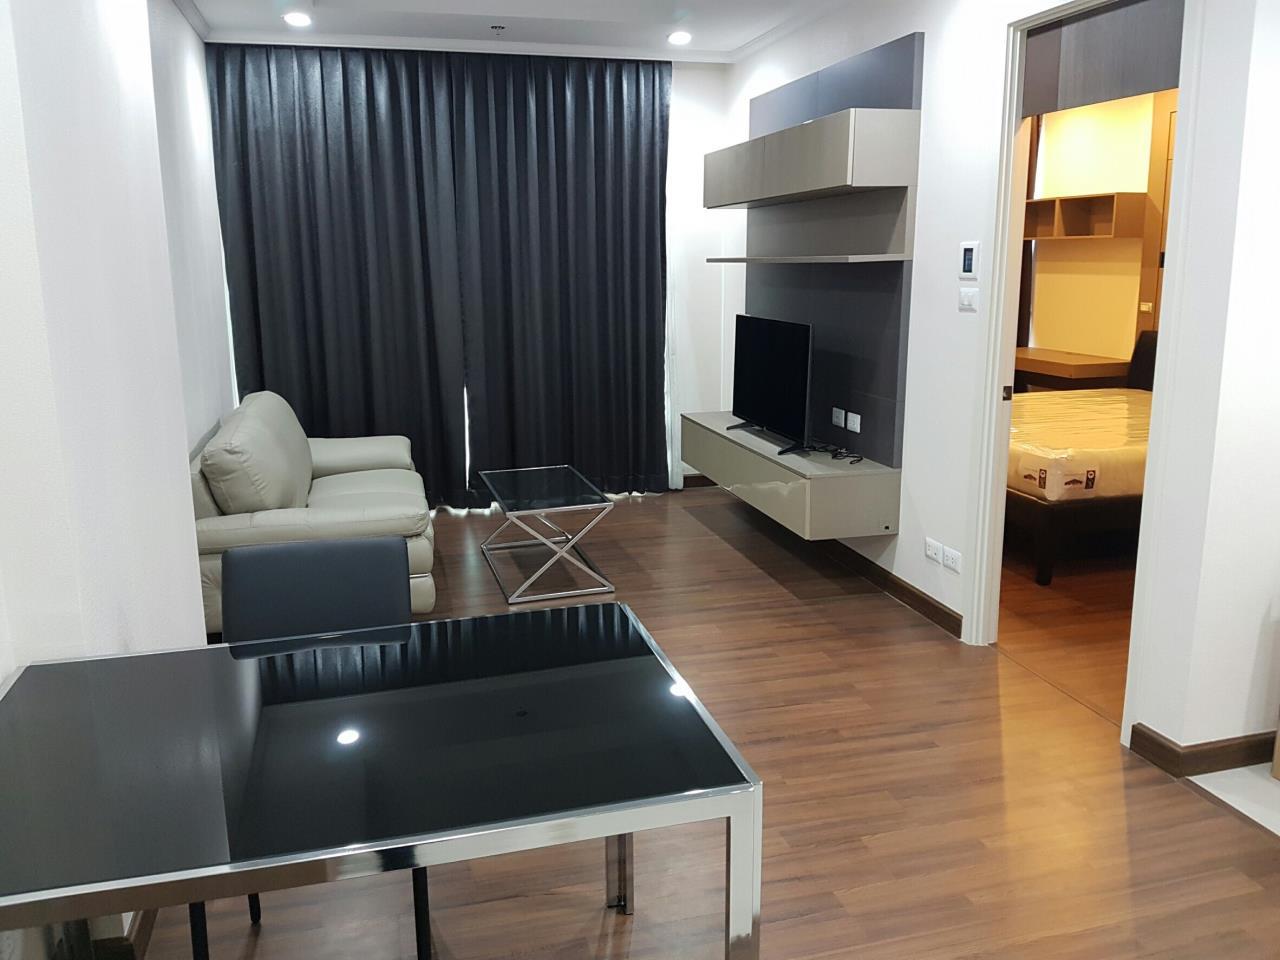 Quality Life Property Agency's supalai elite sathorn-suanplu [ FOR RENT / SALE] 1